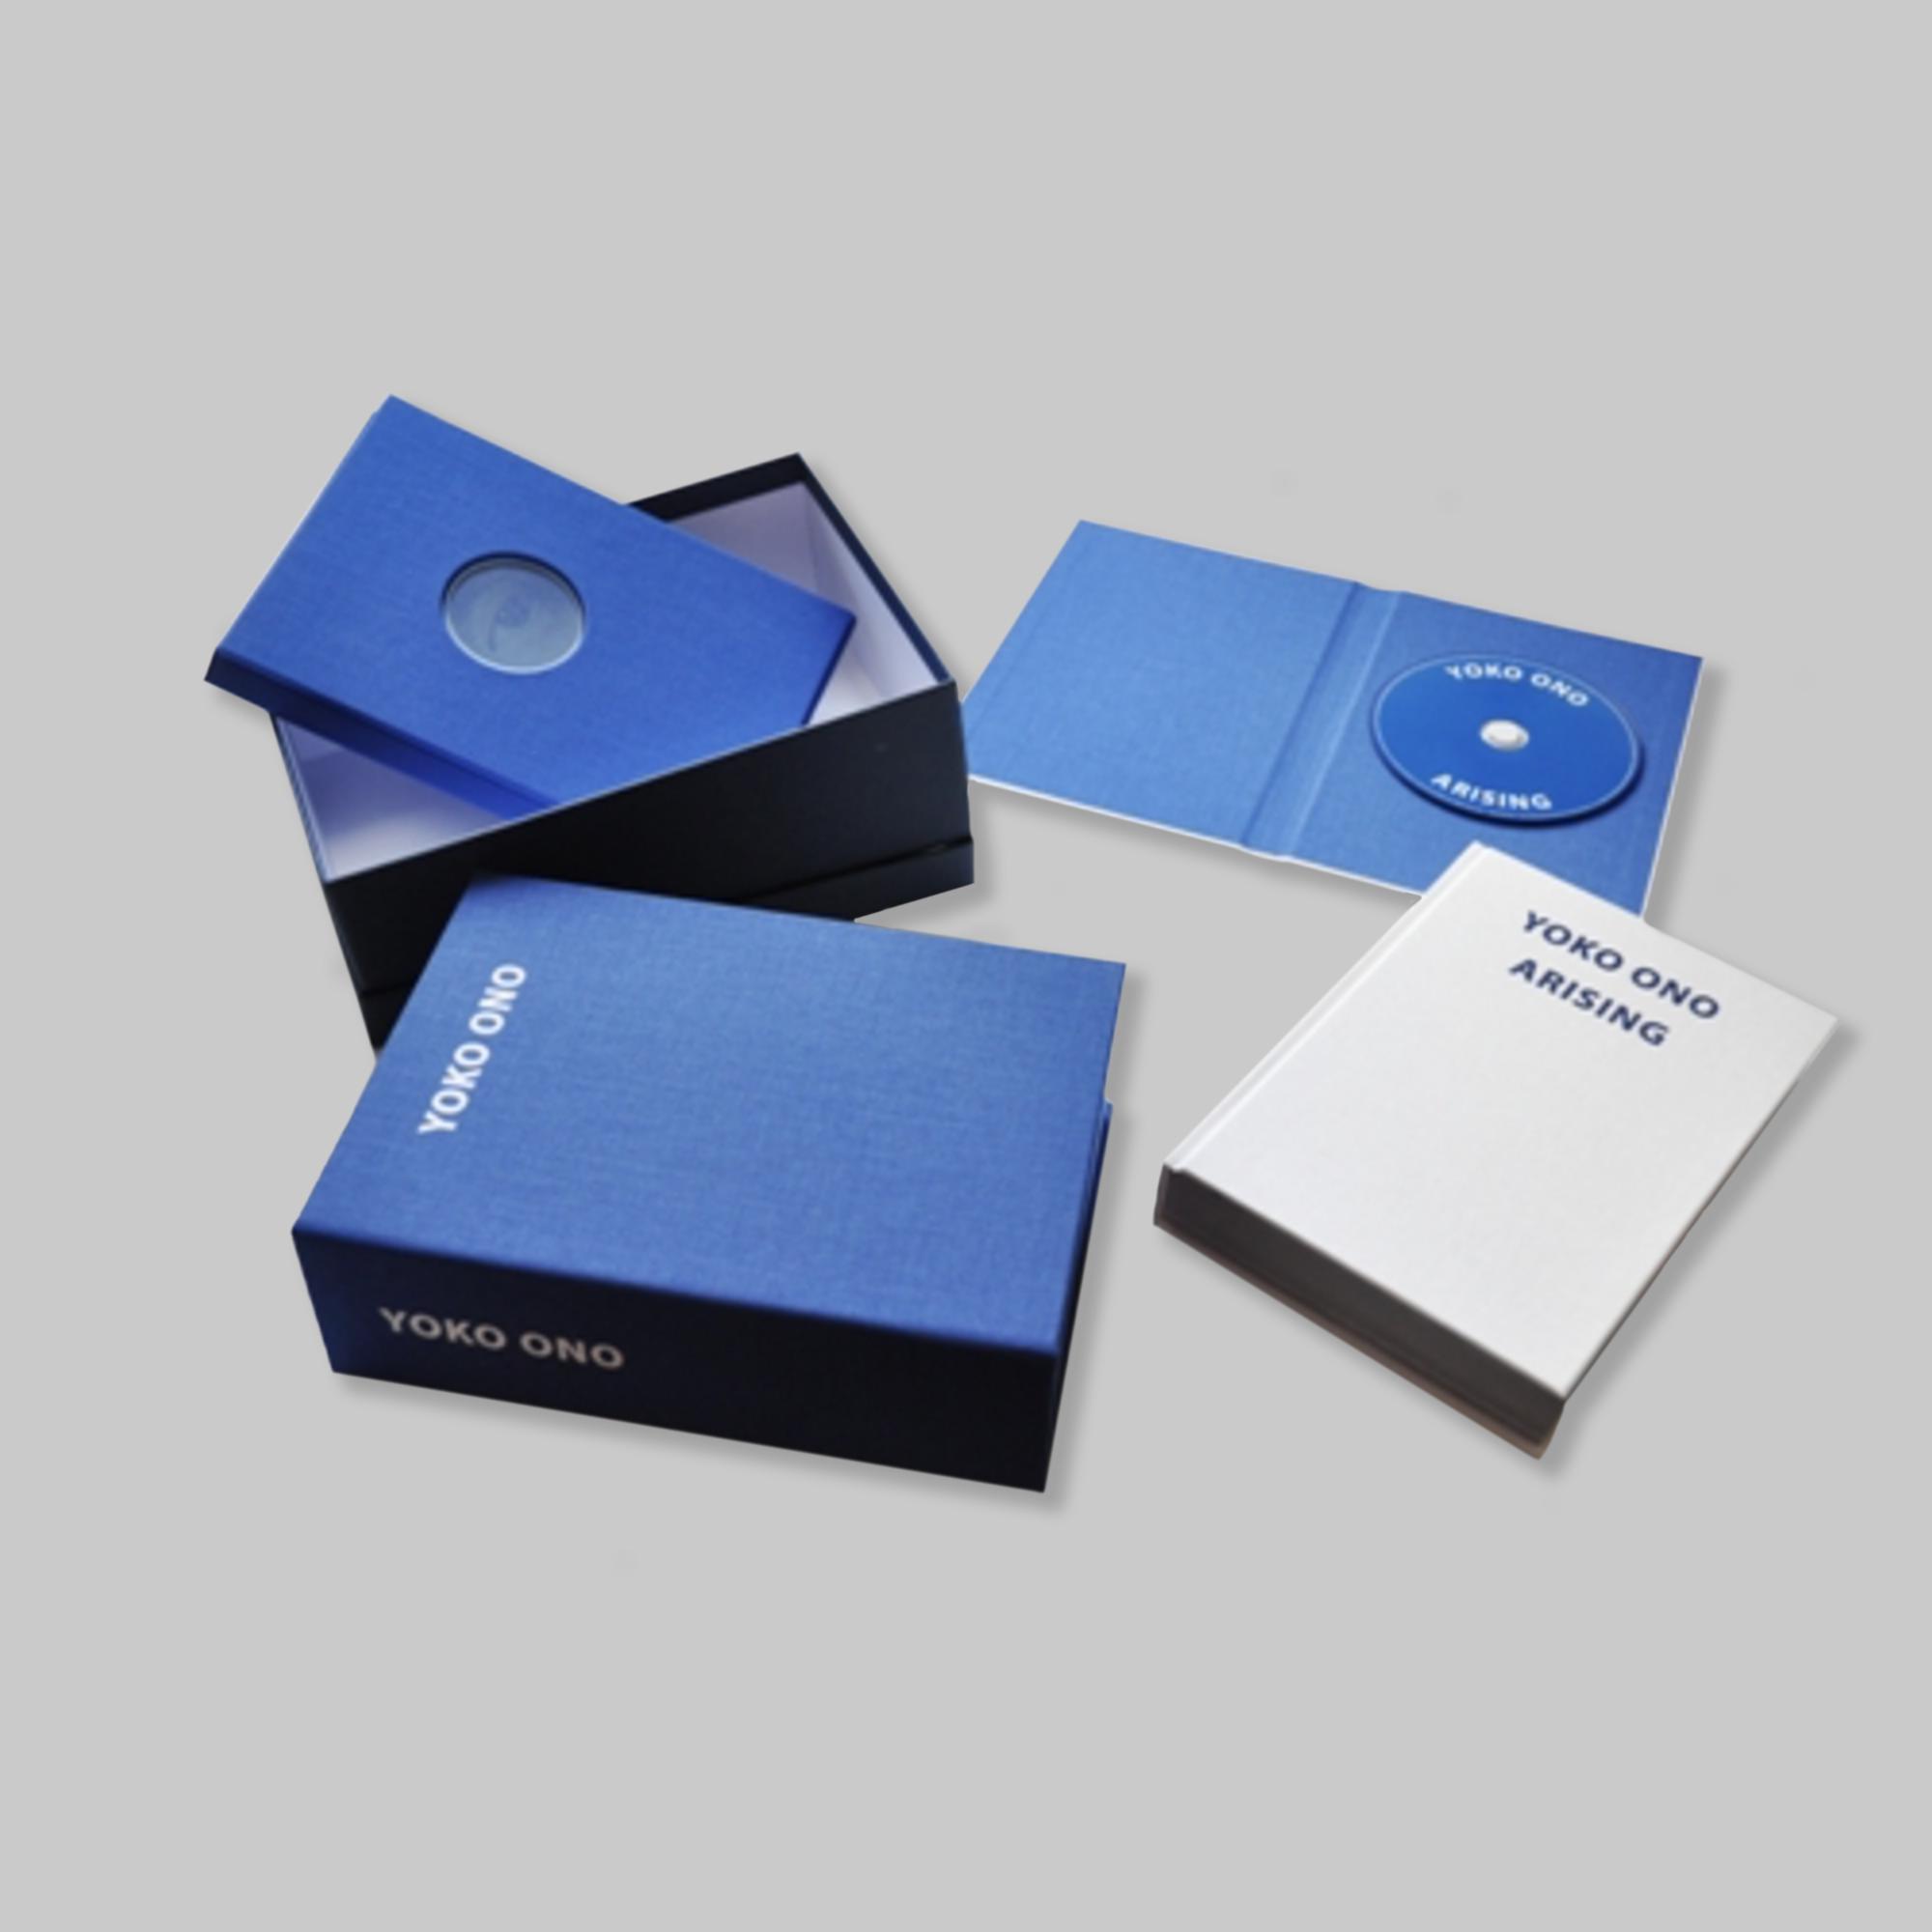 YOKO-ONO-ARISING-DeLuxe-edition-of-50-copies-SIGNED-by-Yoko-Ono